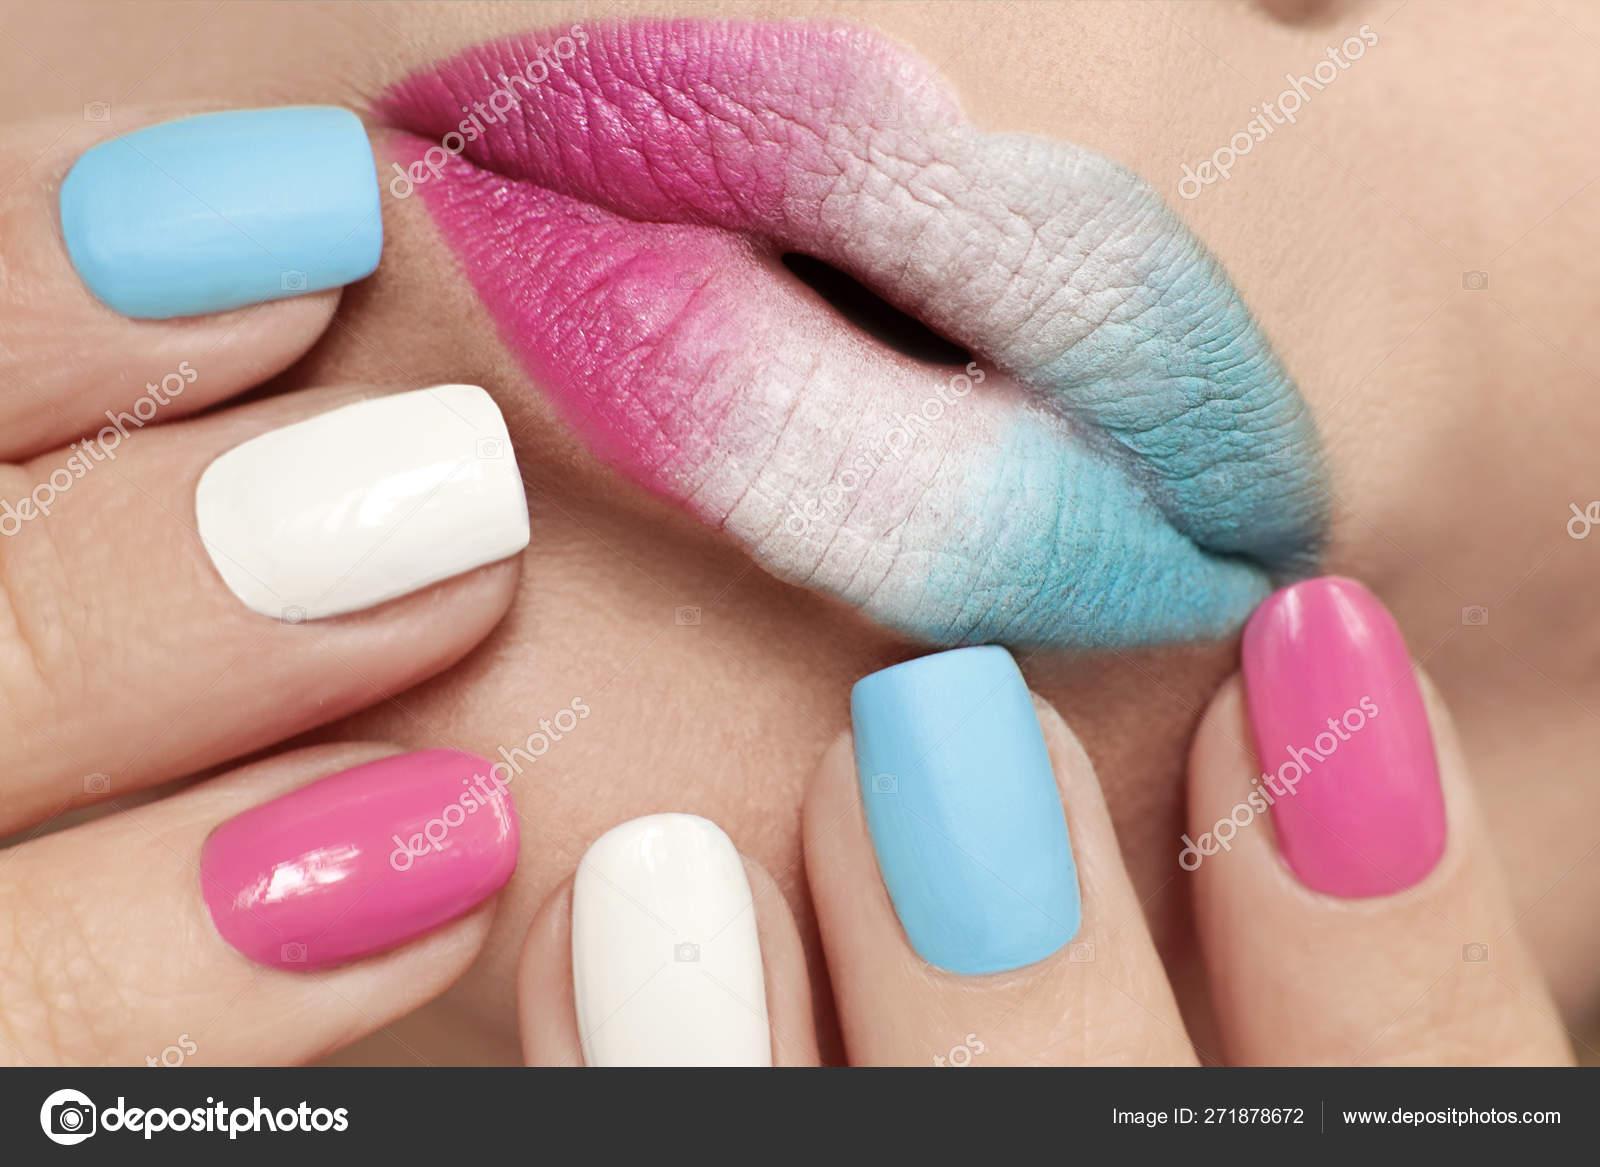 Multi Colored Lip Makeup Nail Design Pink Blue Matte White